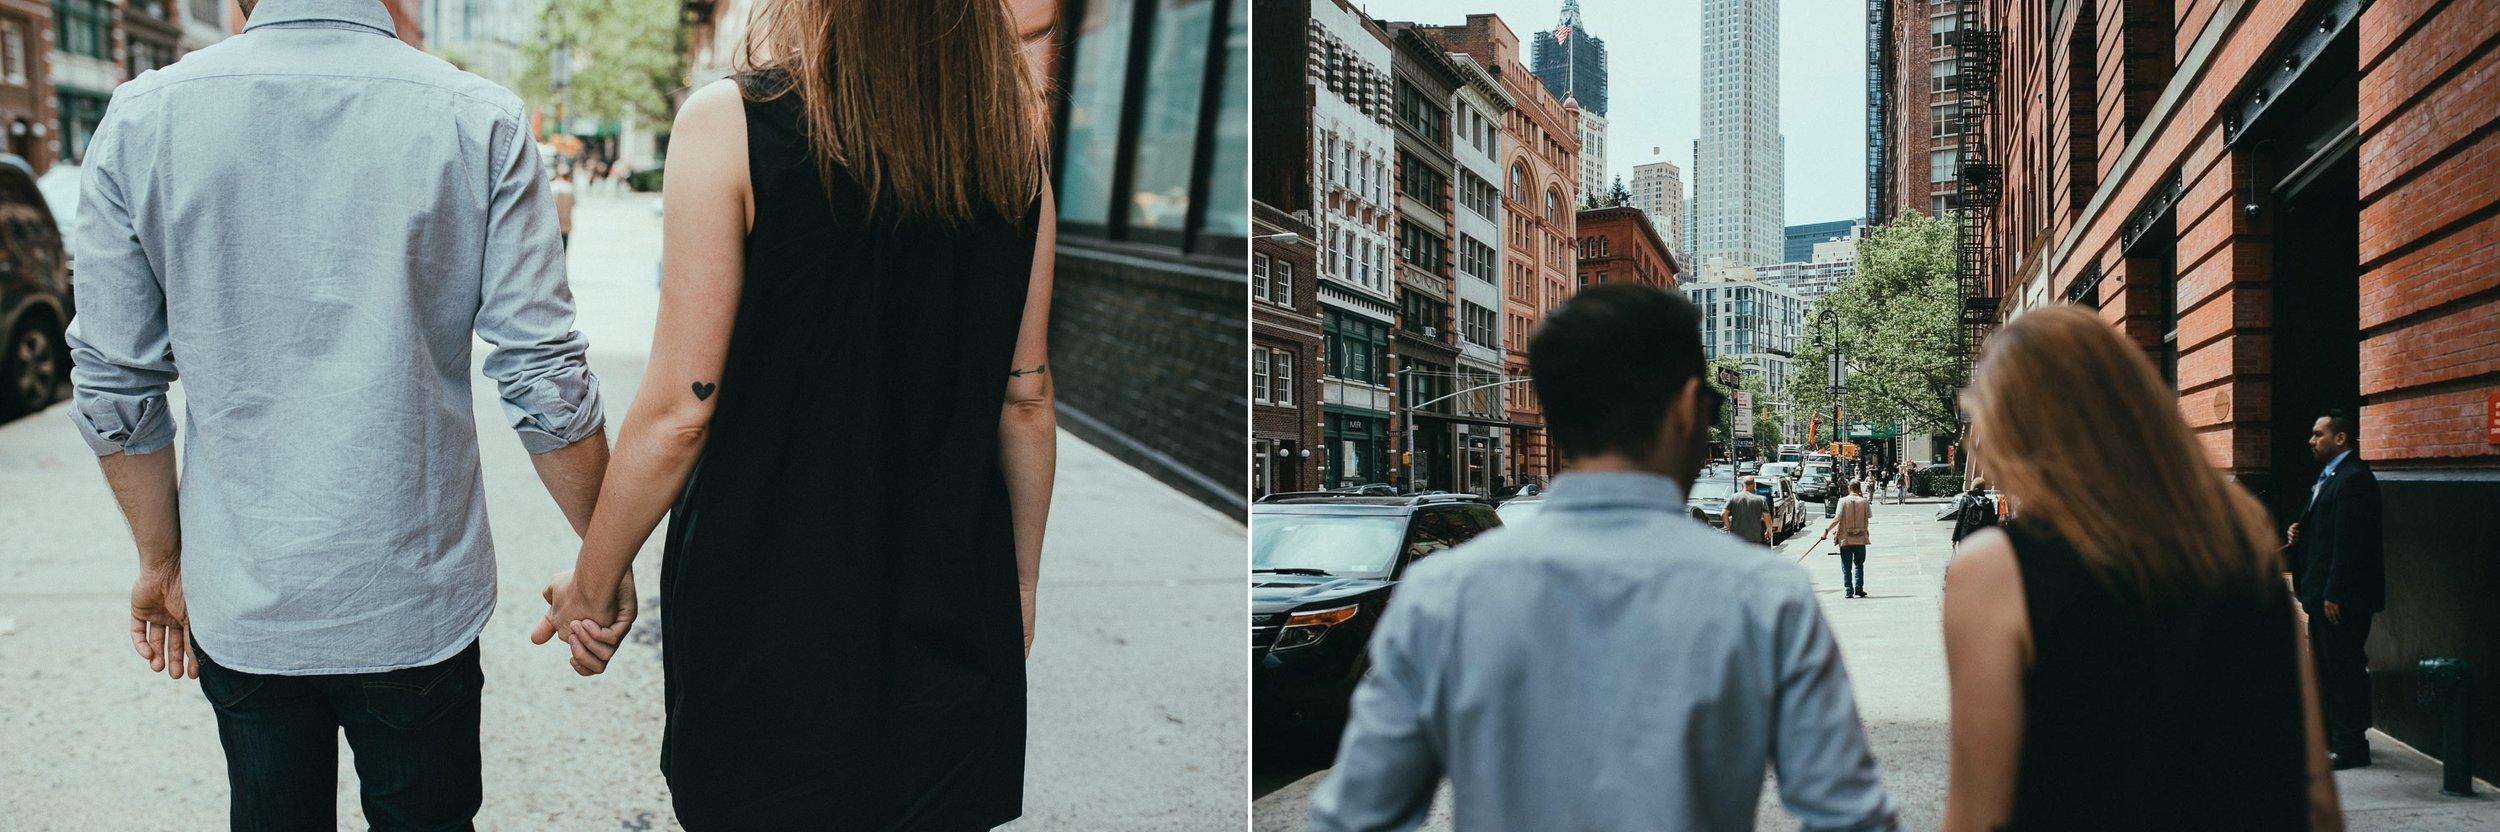 new-york-city-engagement24.jpg